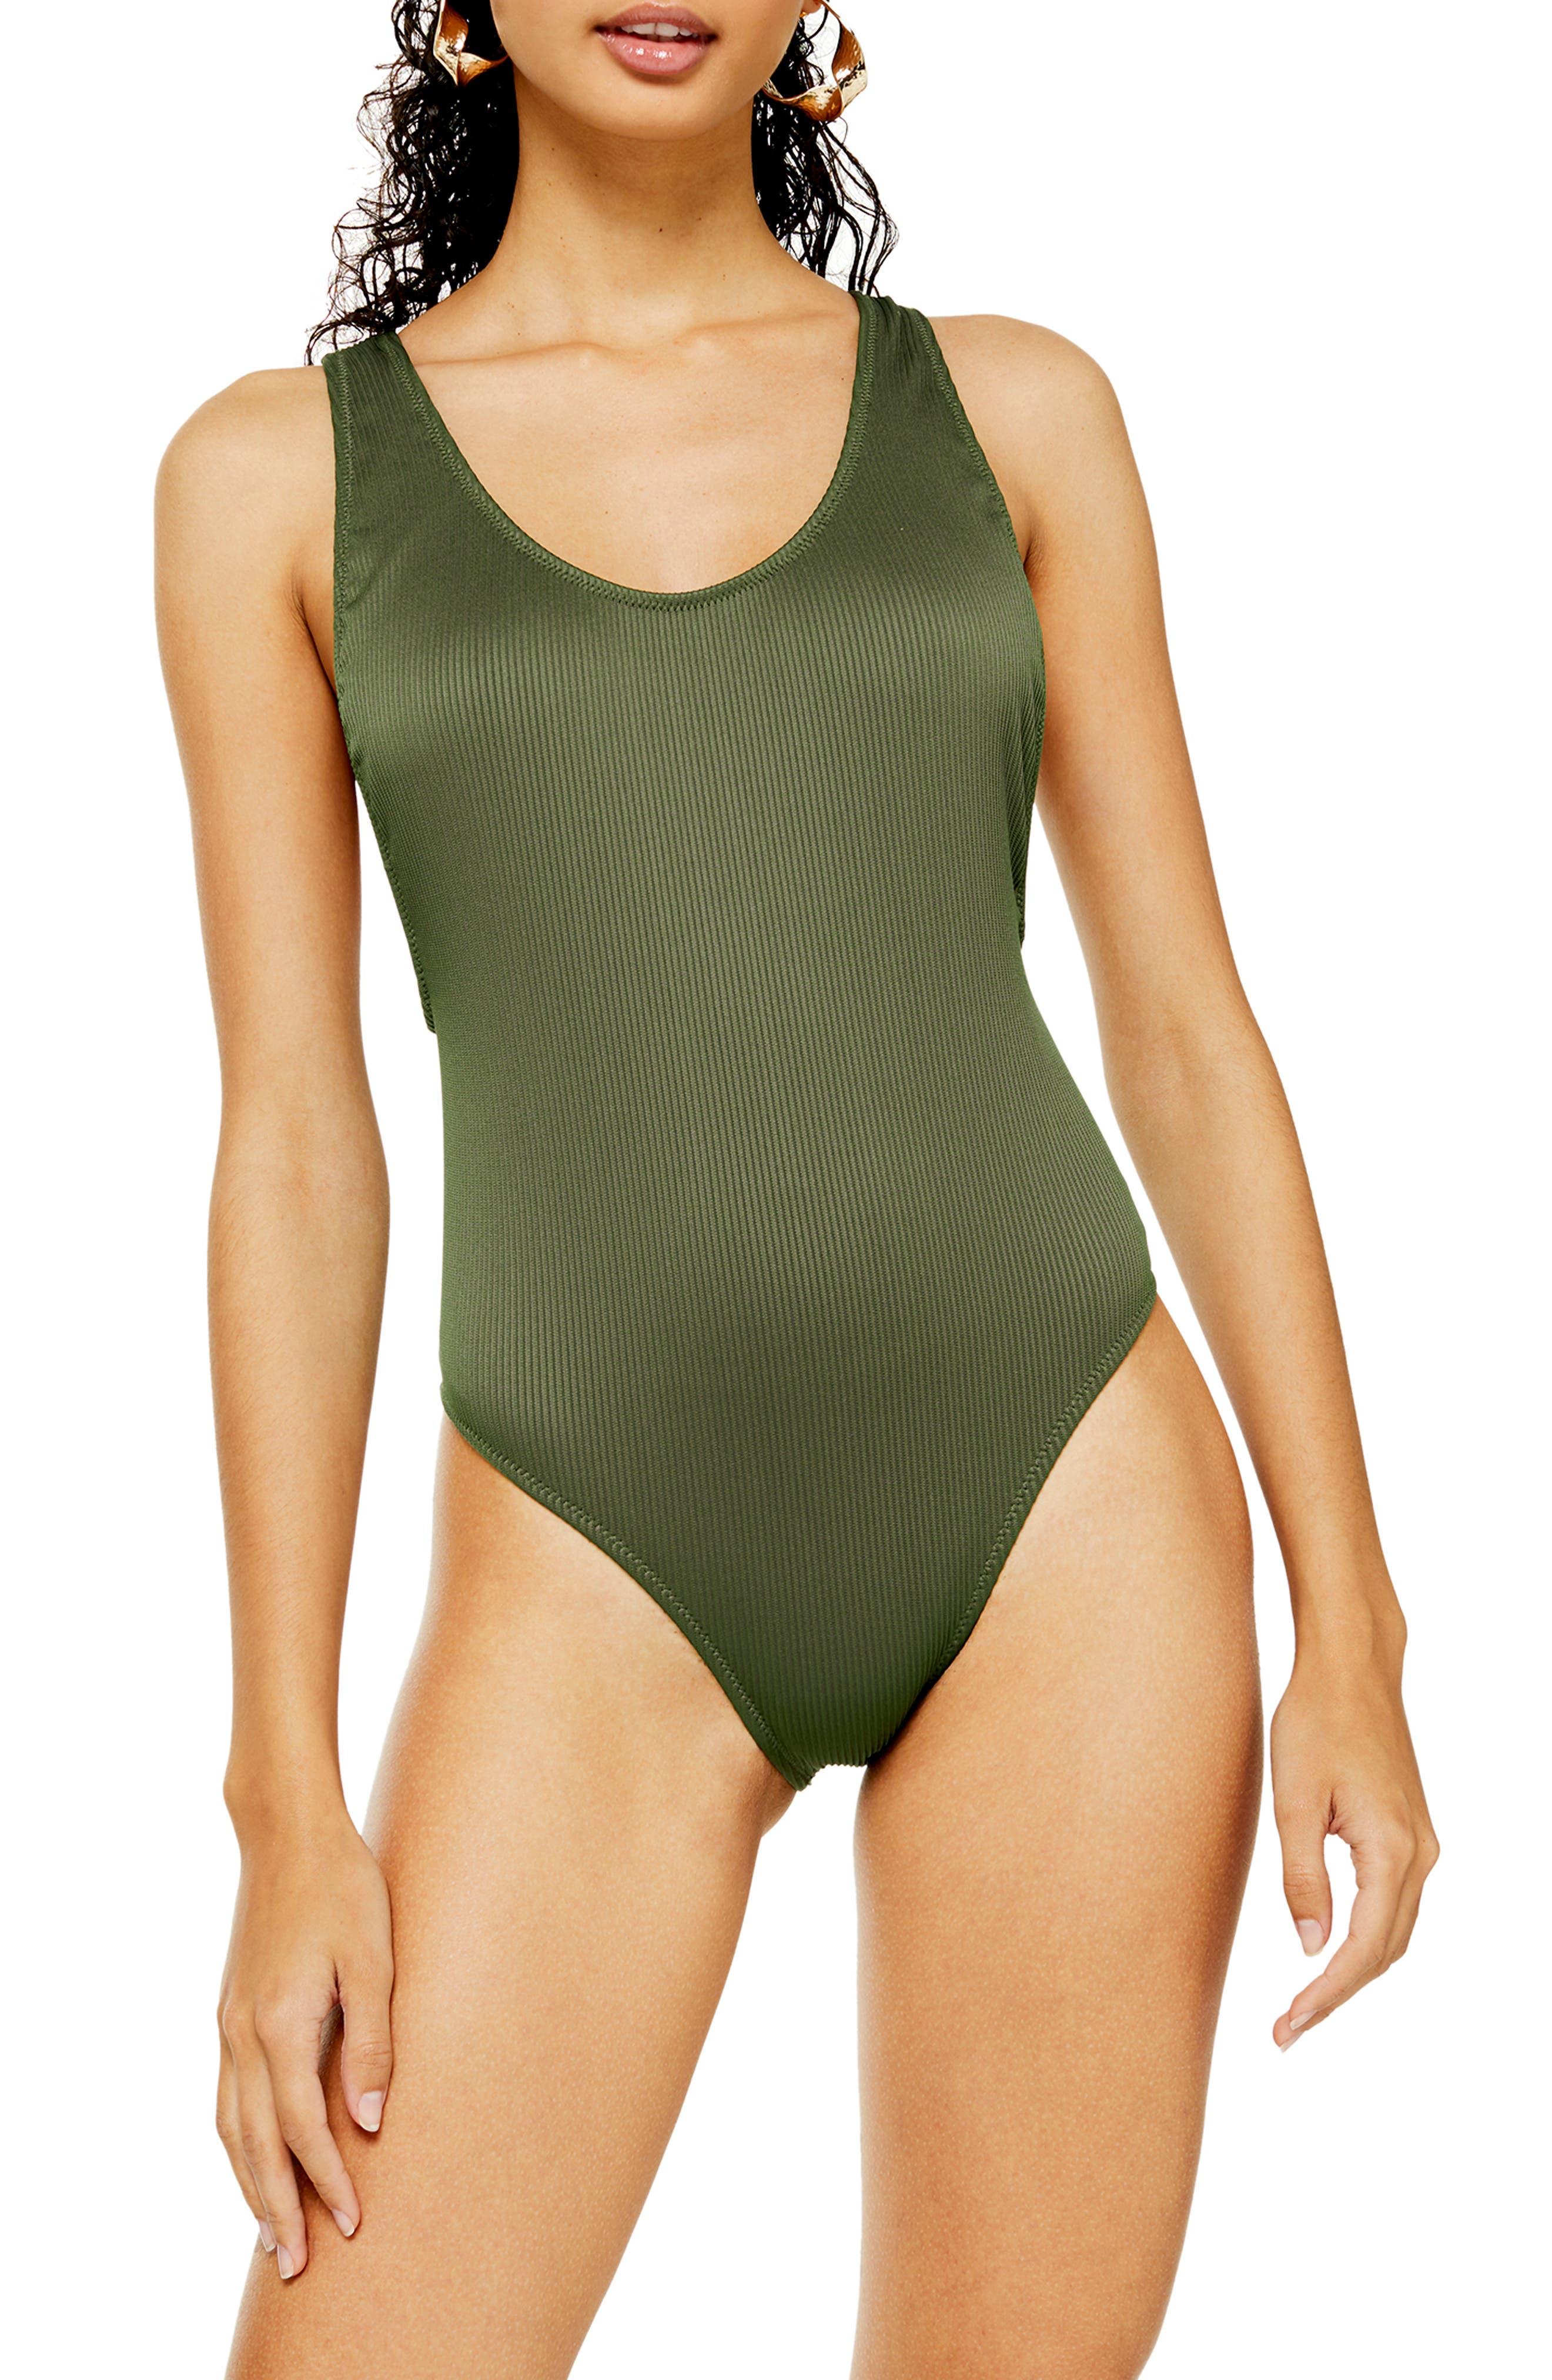 564f6c48904 Women's Topshop Clothing | Nordstrom